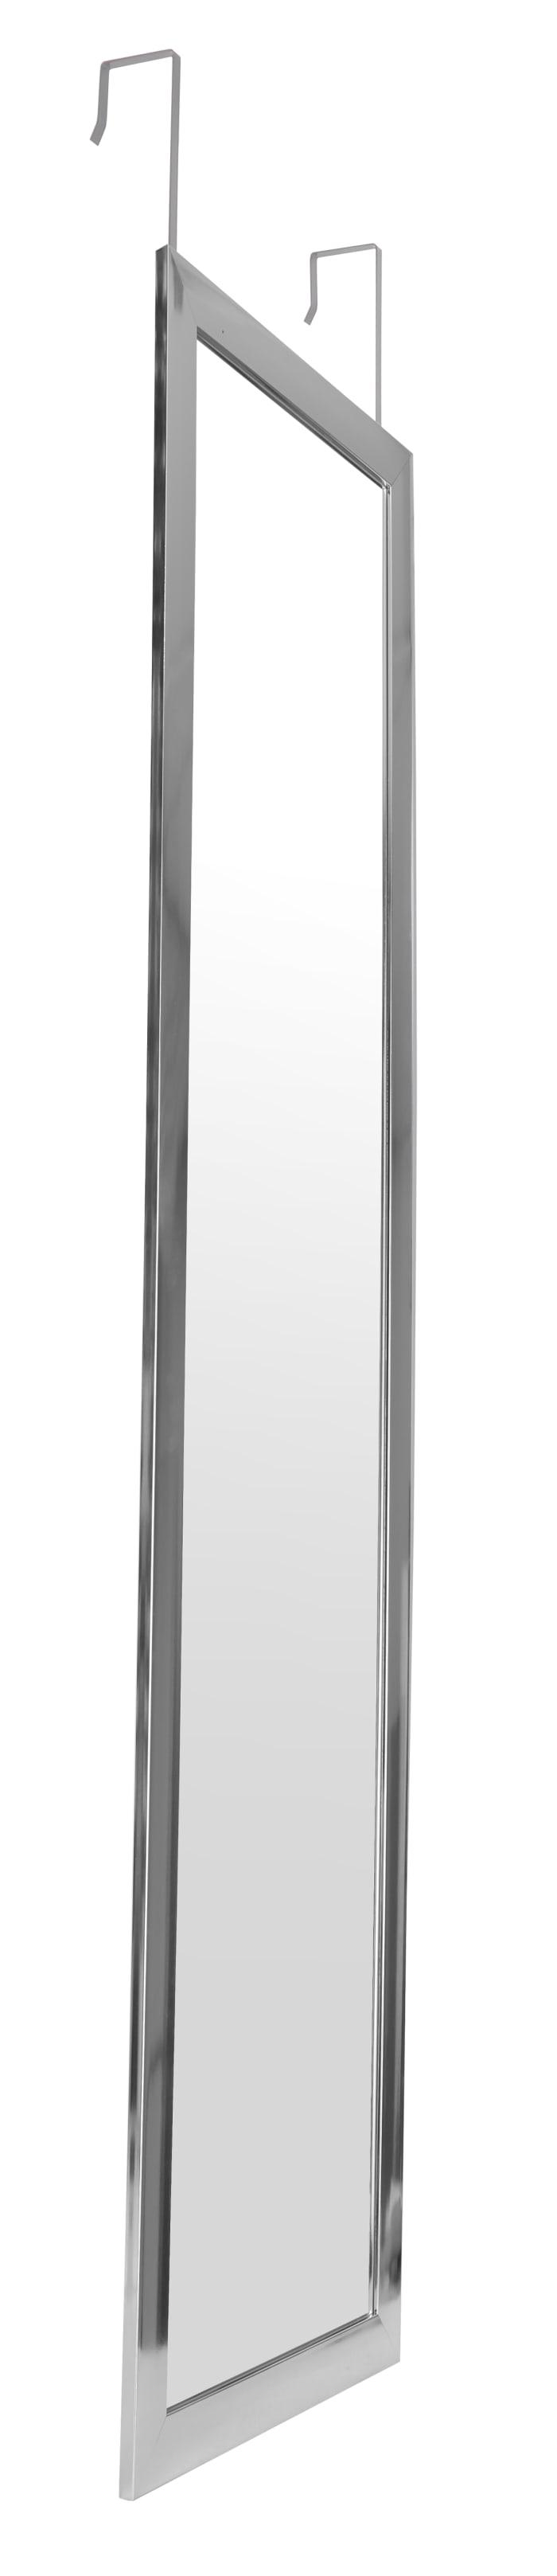 Long Silver Over the Door Dressing Mirror